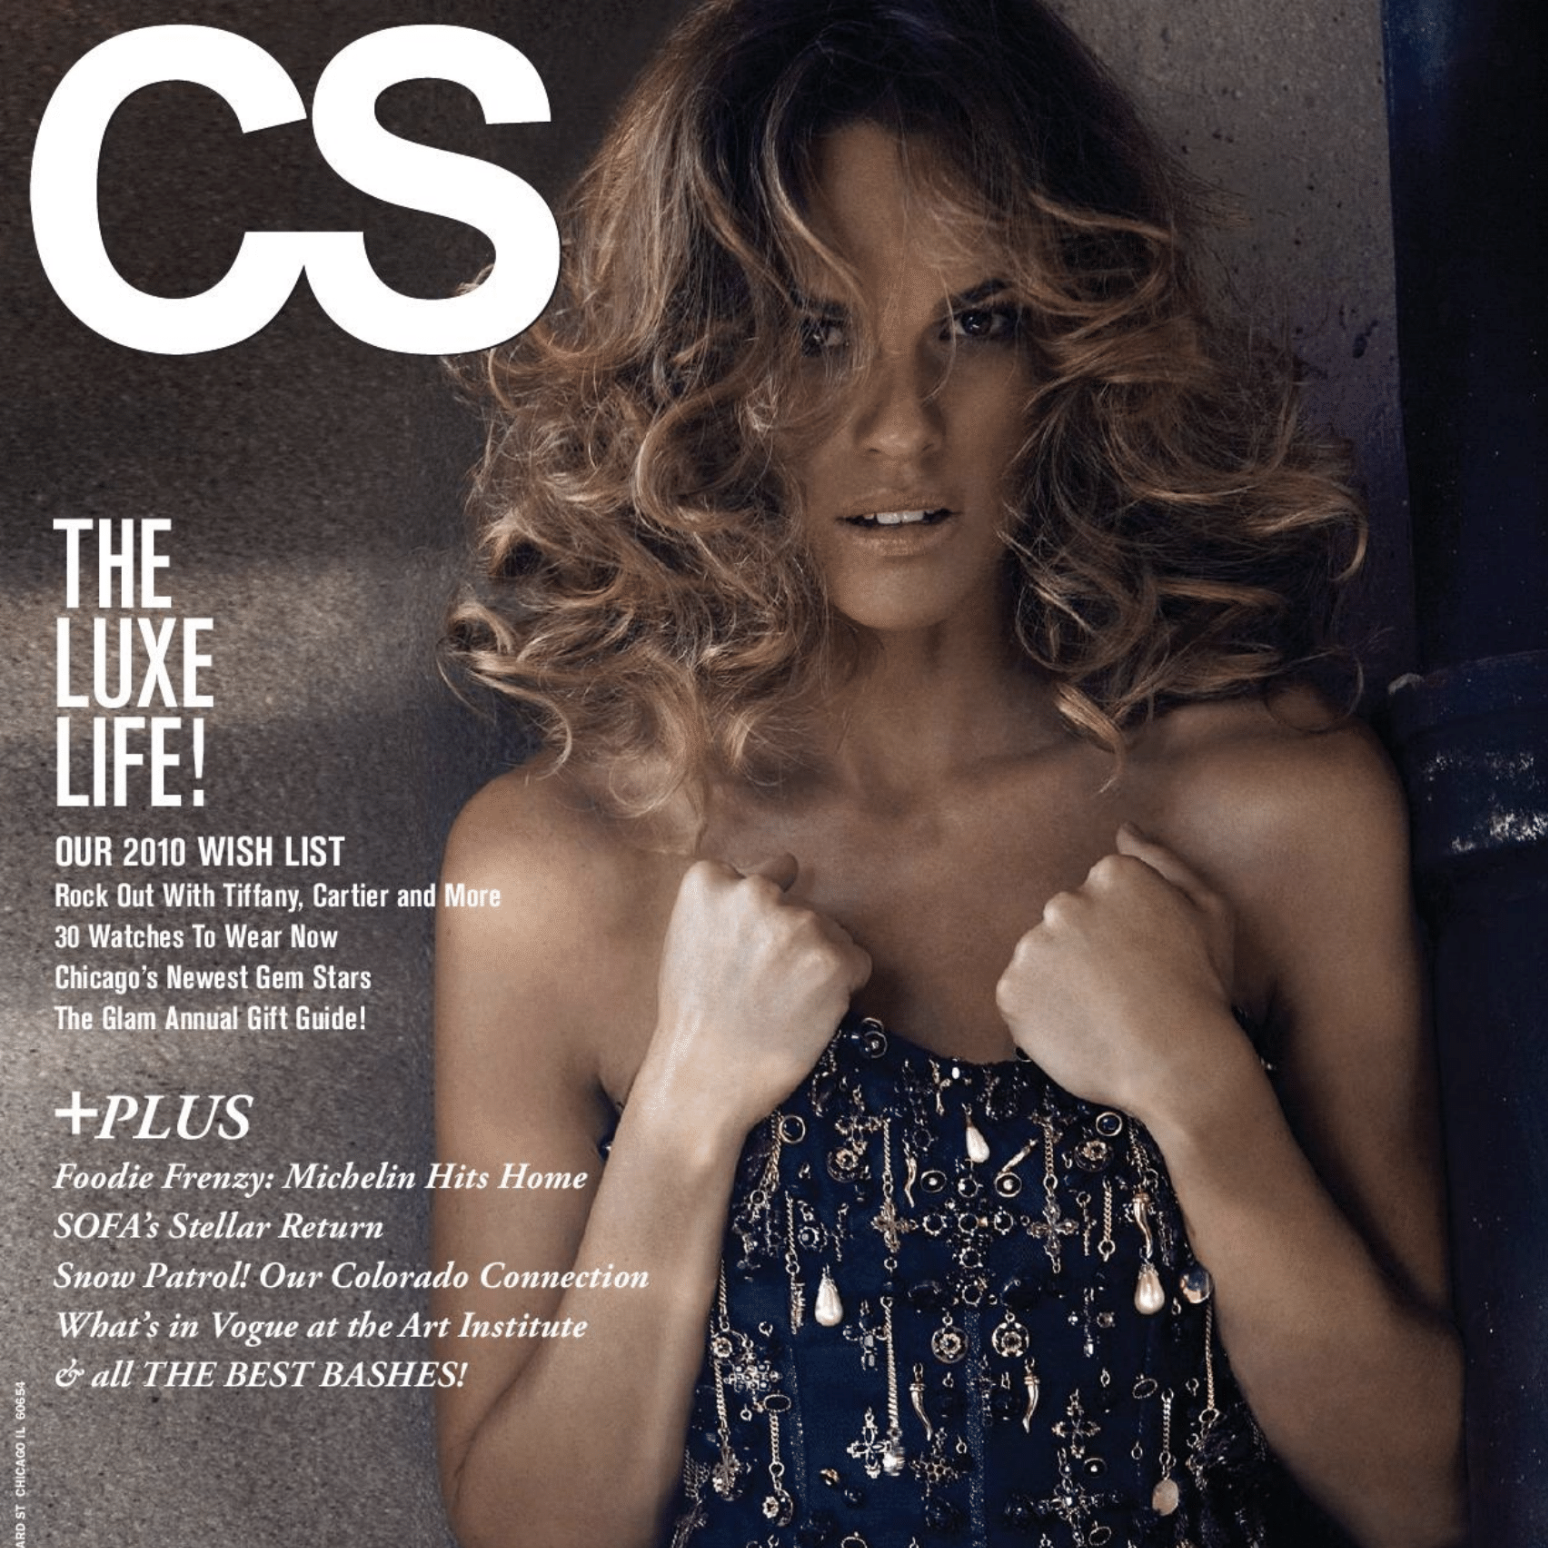 CS Modern Luxury